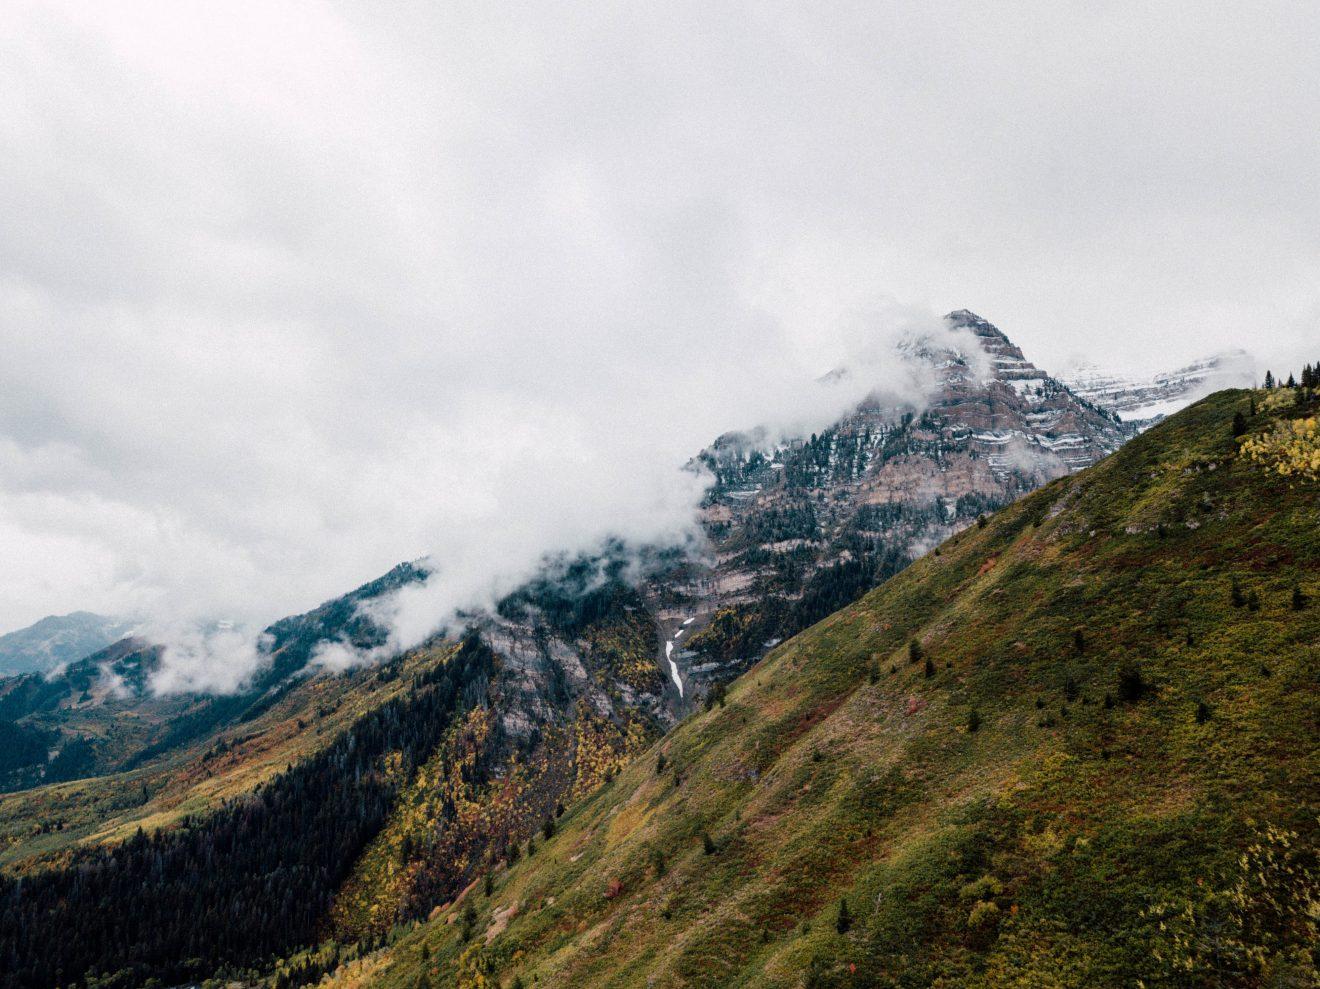 Mount Timpanogos, Wasatch Range near Provo, UT